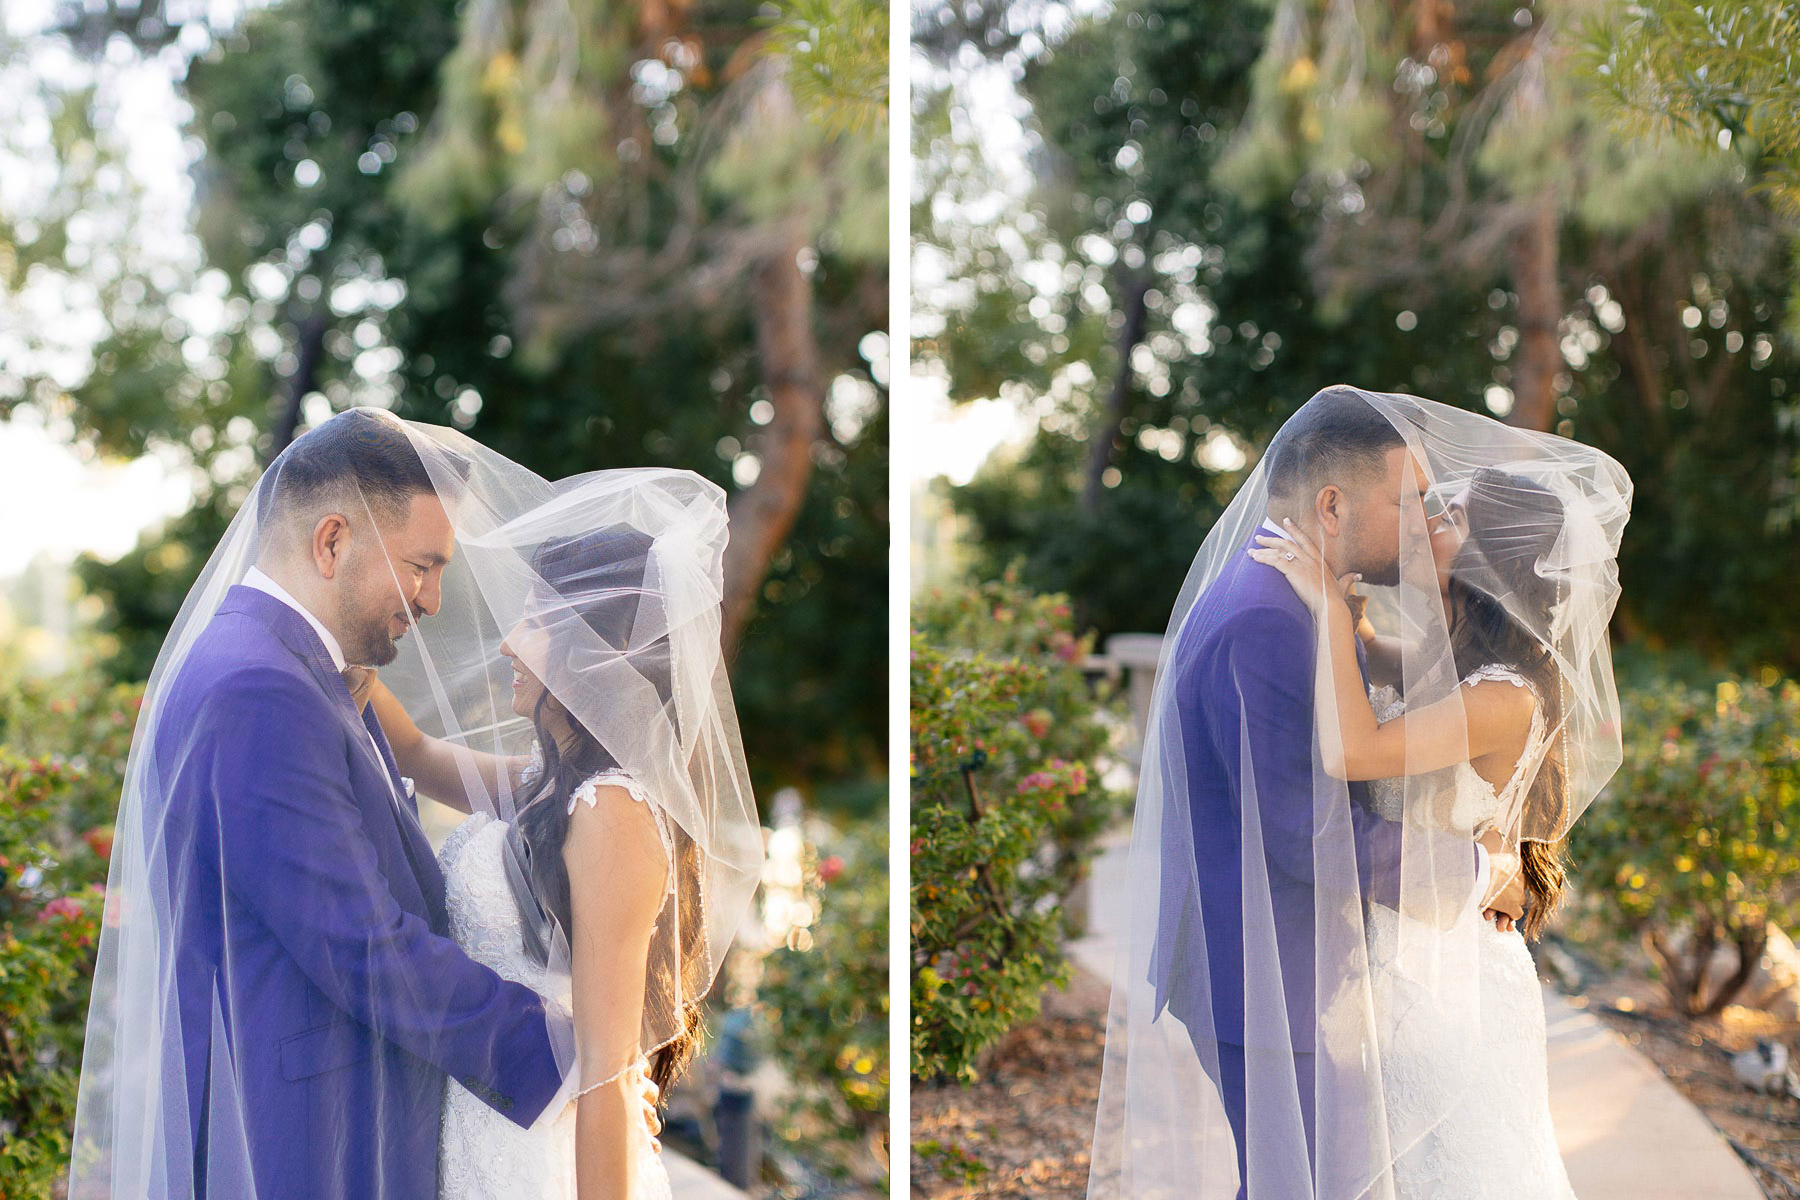 161029-Luxium-Weddings-Arizona-Jeff-Griselda-First-Look-Val-Vista-Lakes-Gilber-054a.jpg